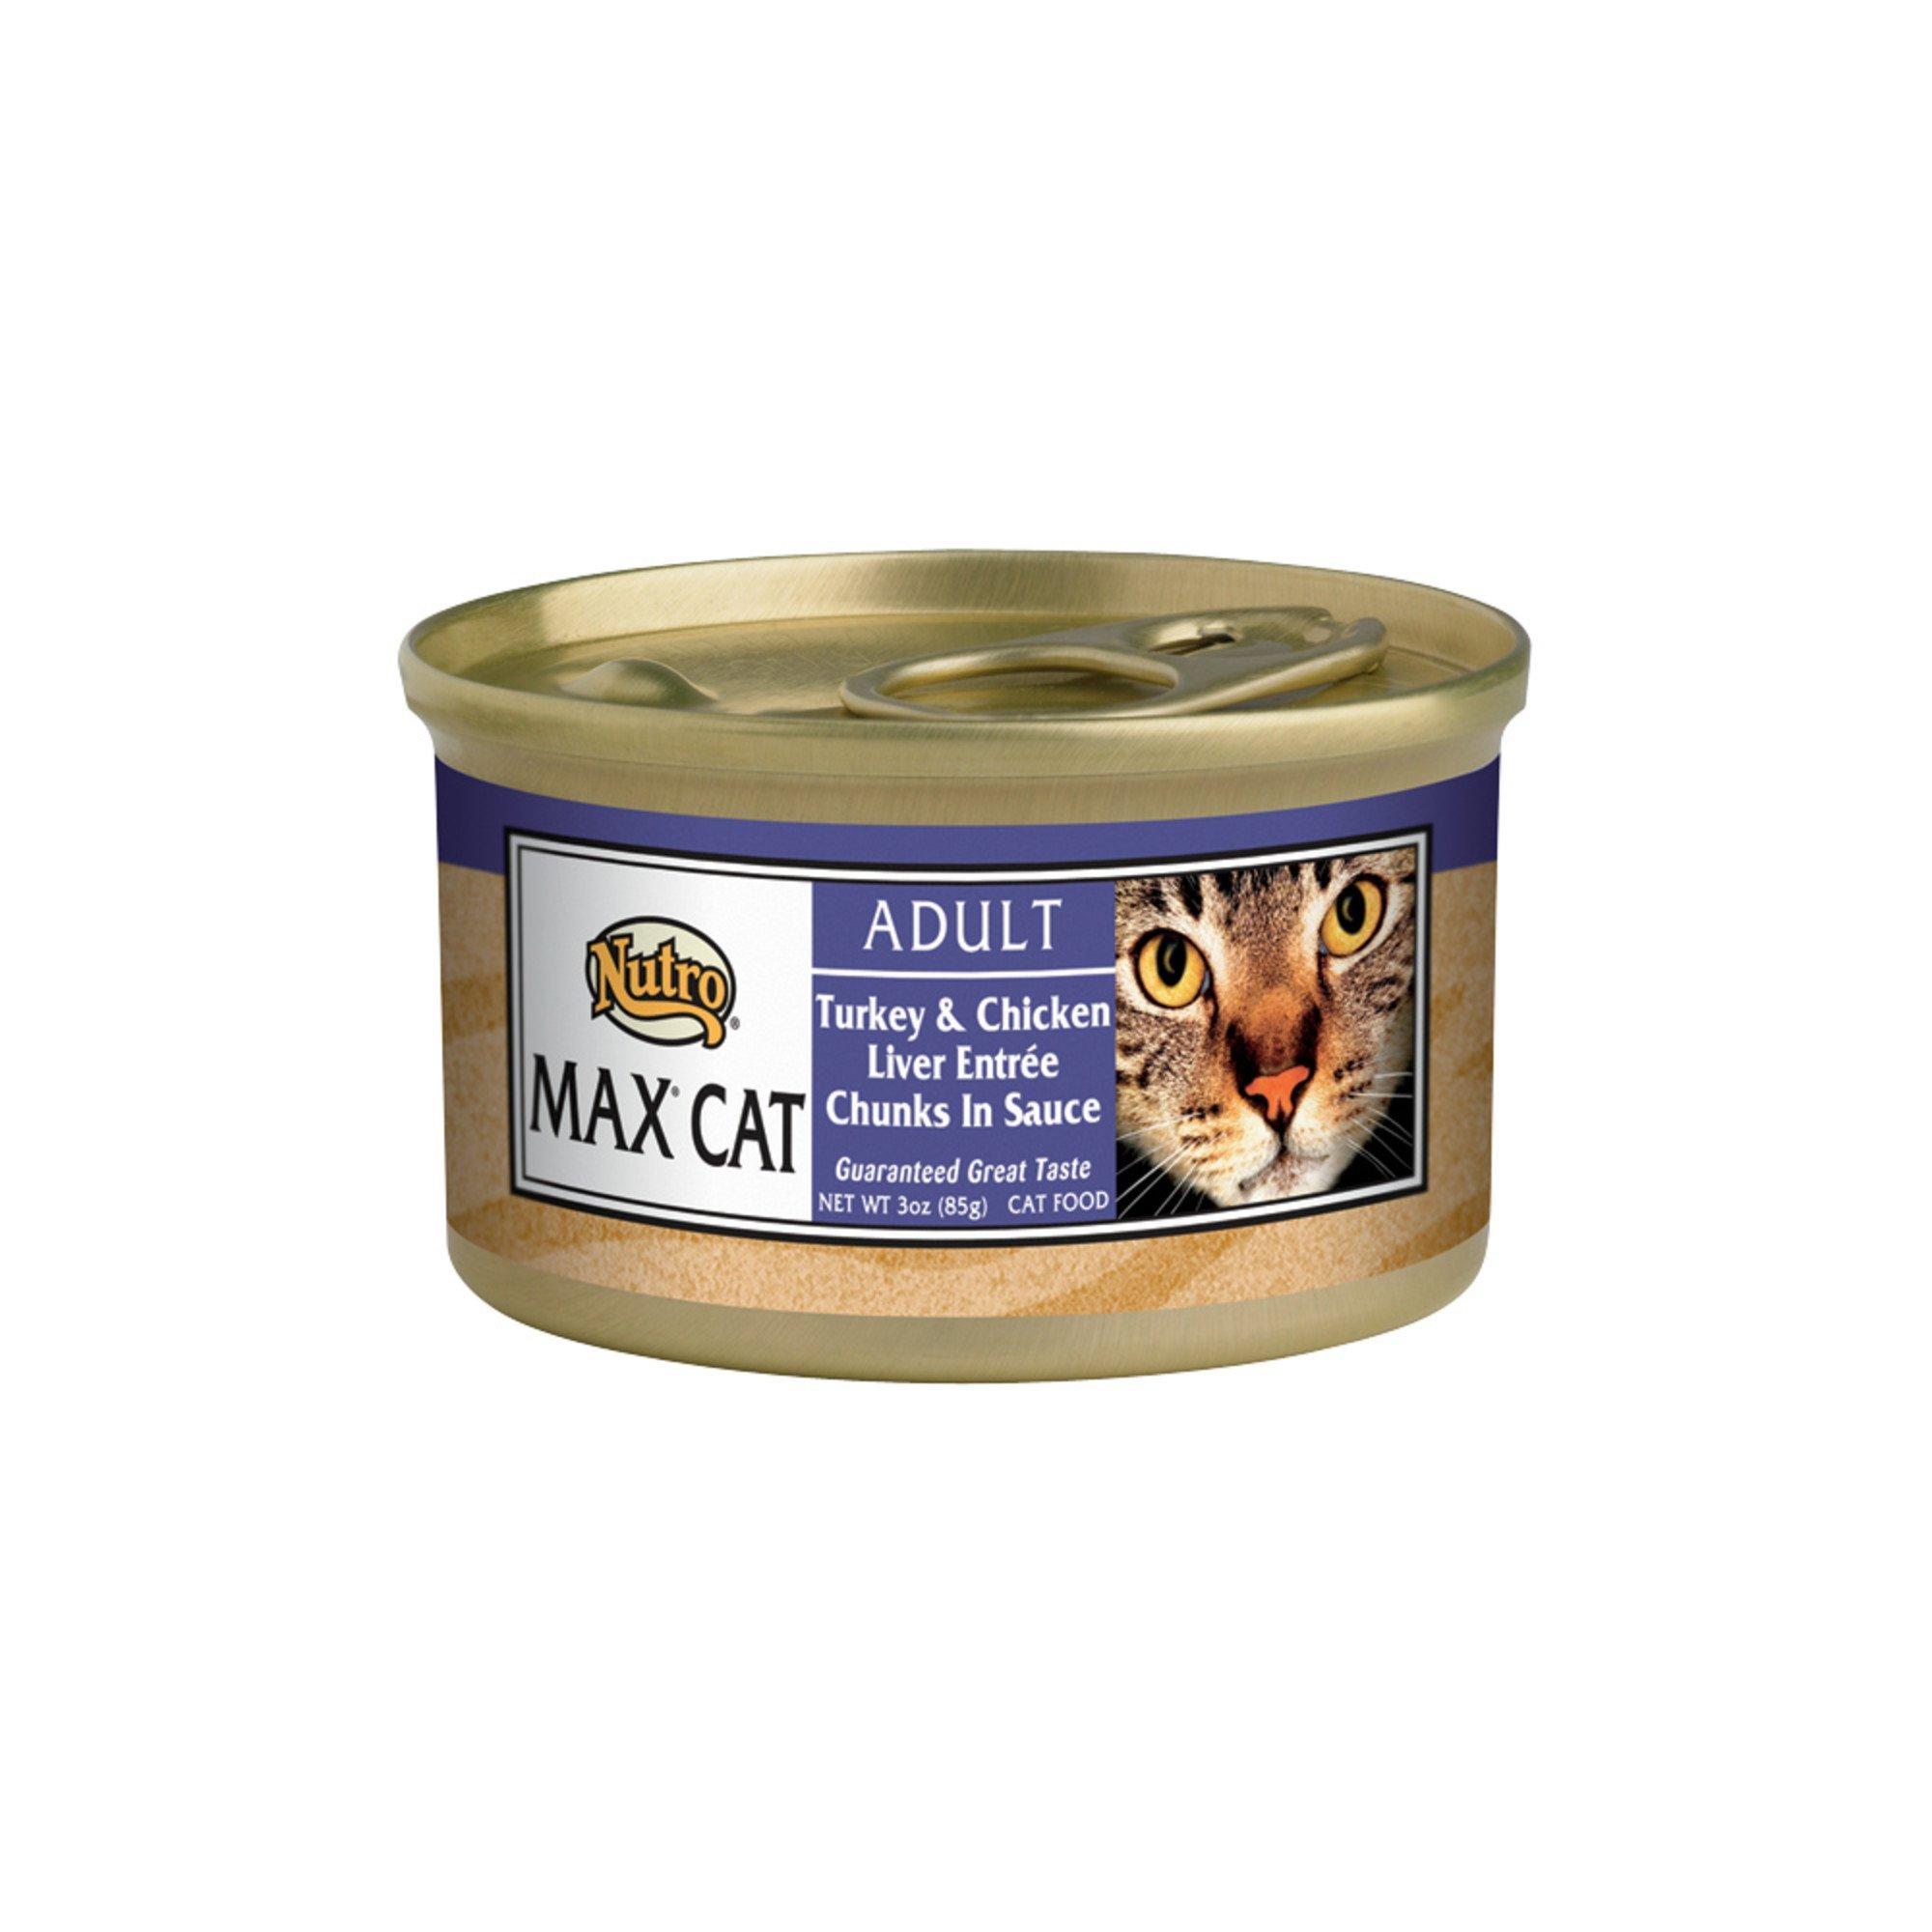 Nutro MAX CAT Turkey & Chicken Liver Saute Gourmet Classics Adult Cat Food